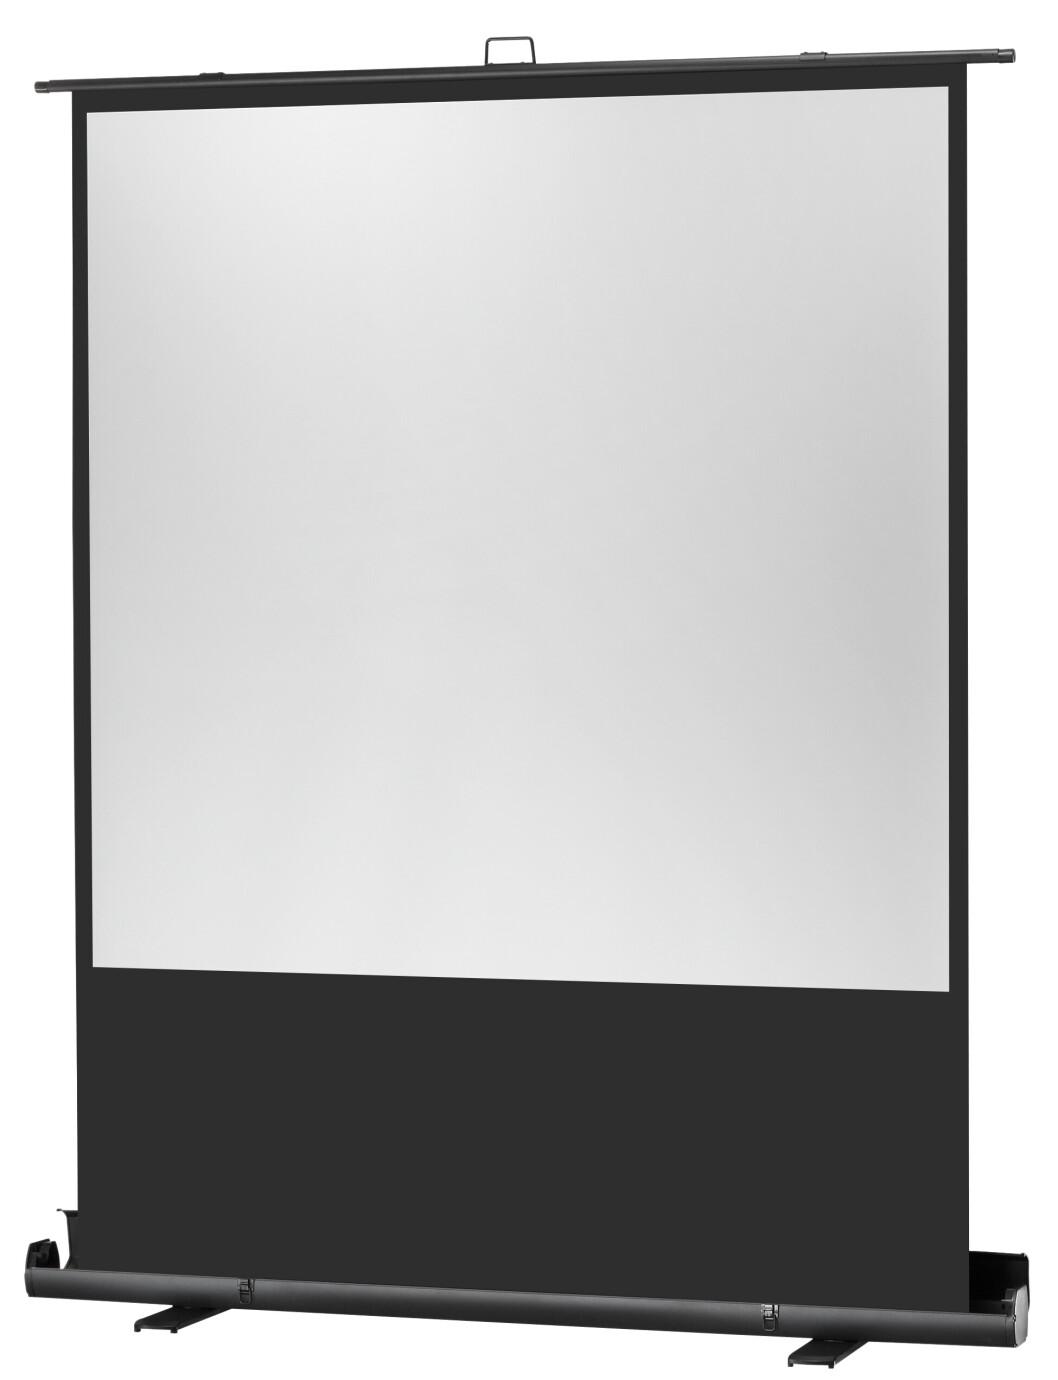 Celexon - Ultramobile Professional - 120 x 120cm - 1:1 Portable Projector Screen - 1091780 - 1:1